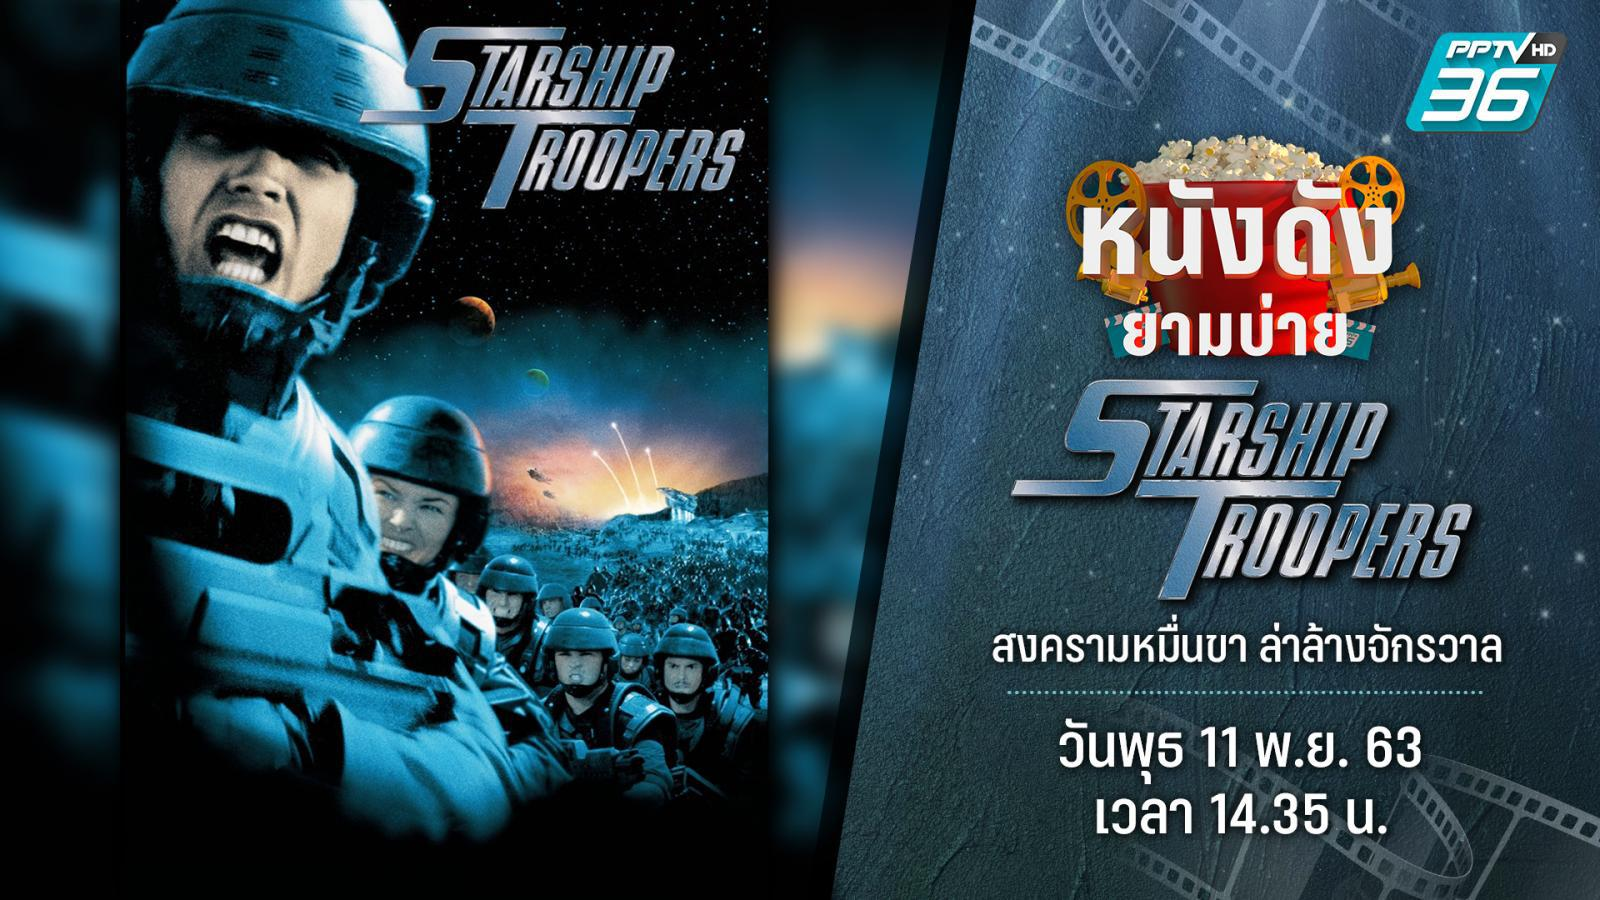 Starship Troopers สงครามหมื่นขา ล่าล้างจักรวาล